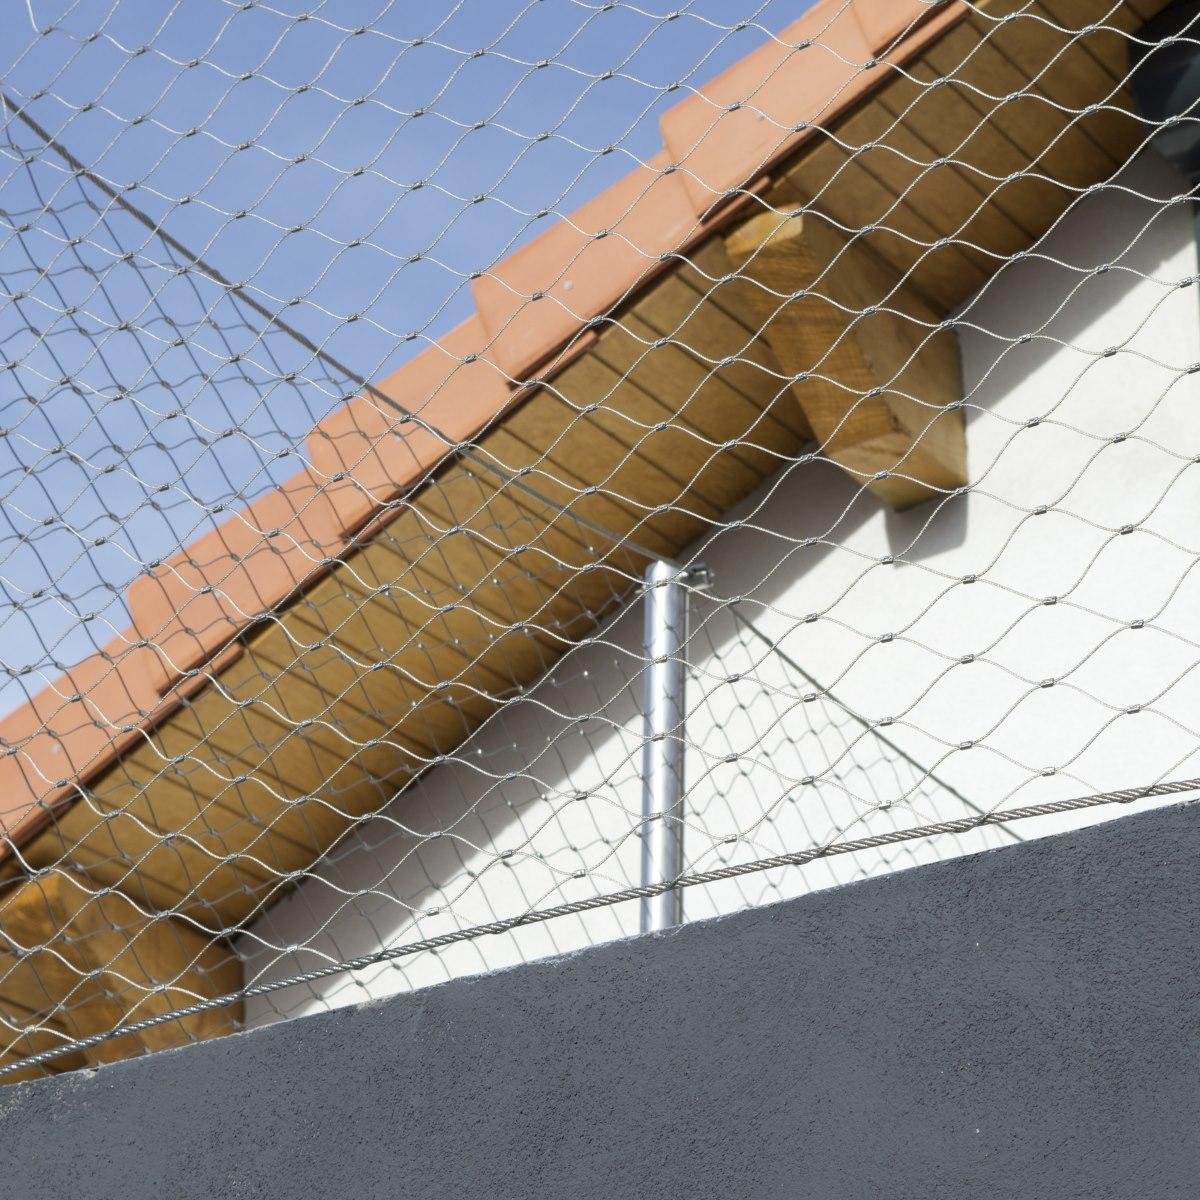 extension-contemporaine-villa-marseille-teintes-materiaux-terre-beton-acier-jeremy-azzaro-architecte